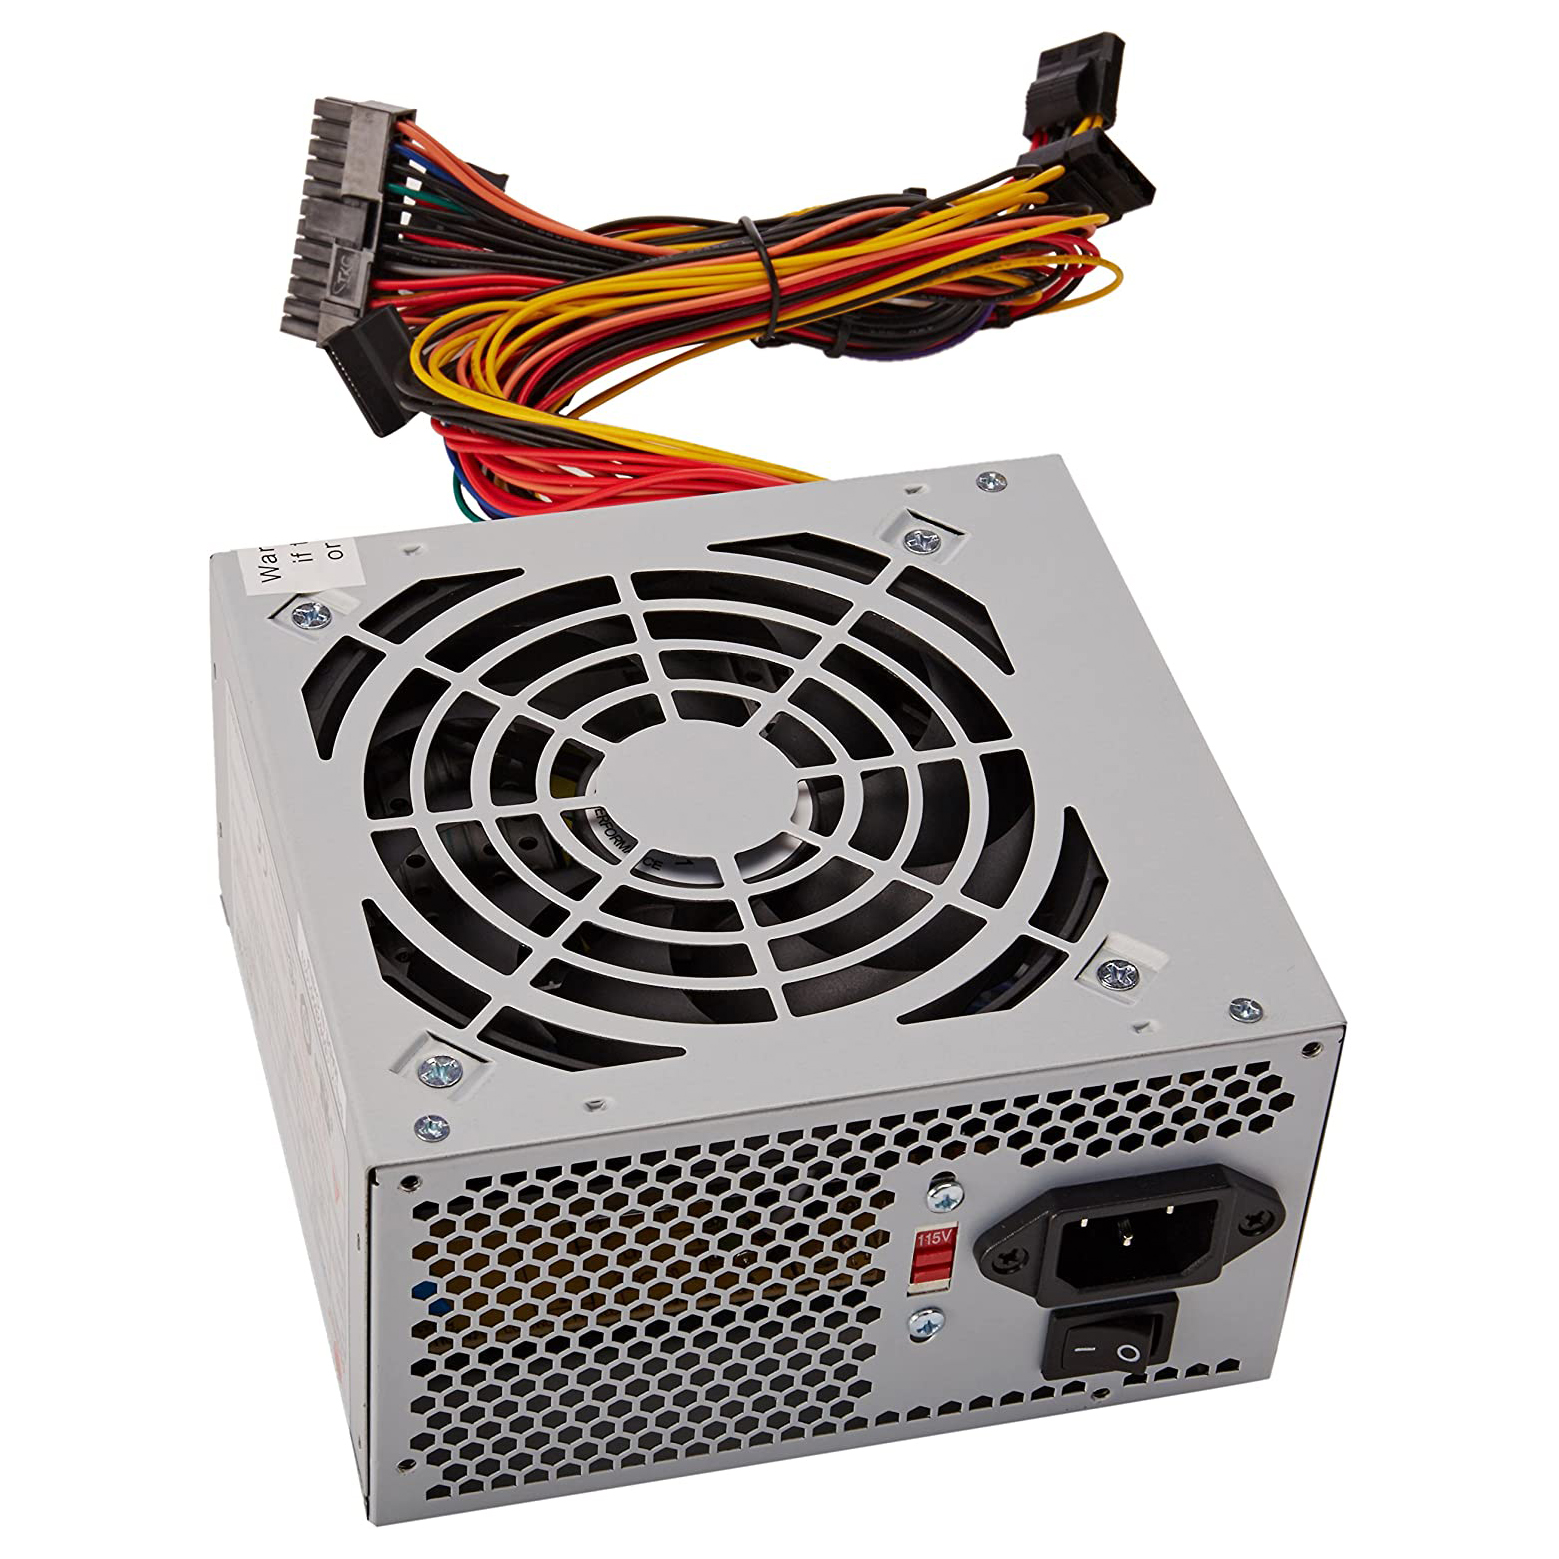 POWER SUPPLY I-NIX ATX 500W 24PIN LGA REAL 200W ,Case & Power Supply